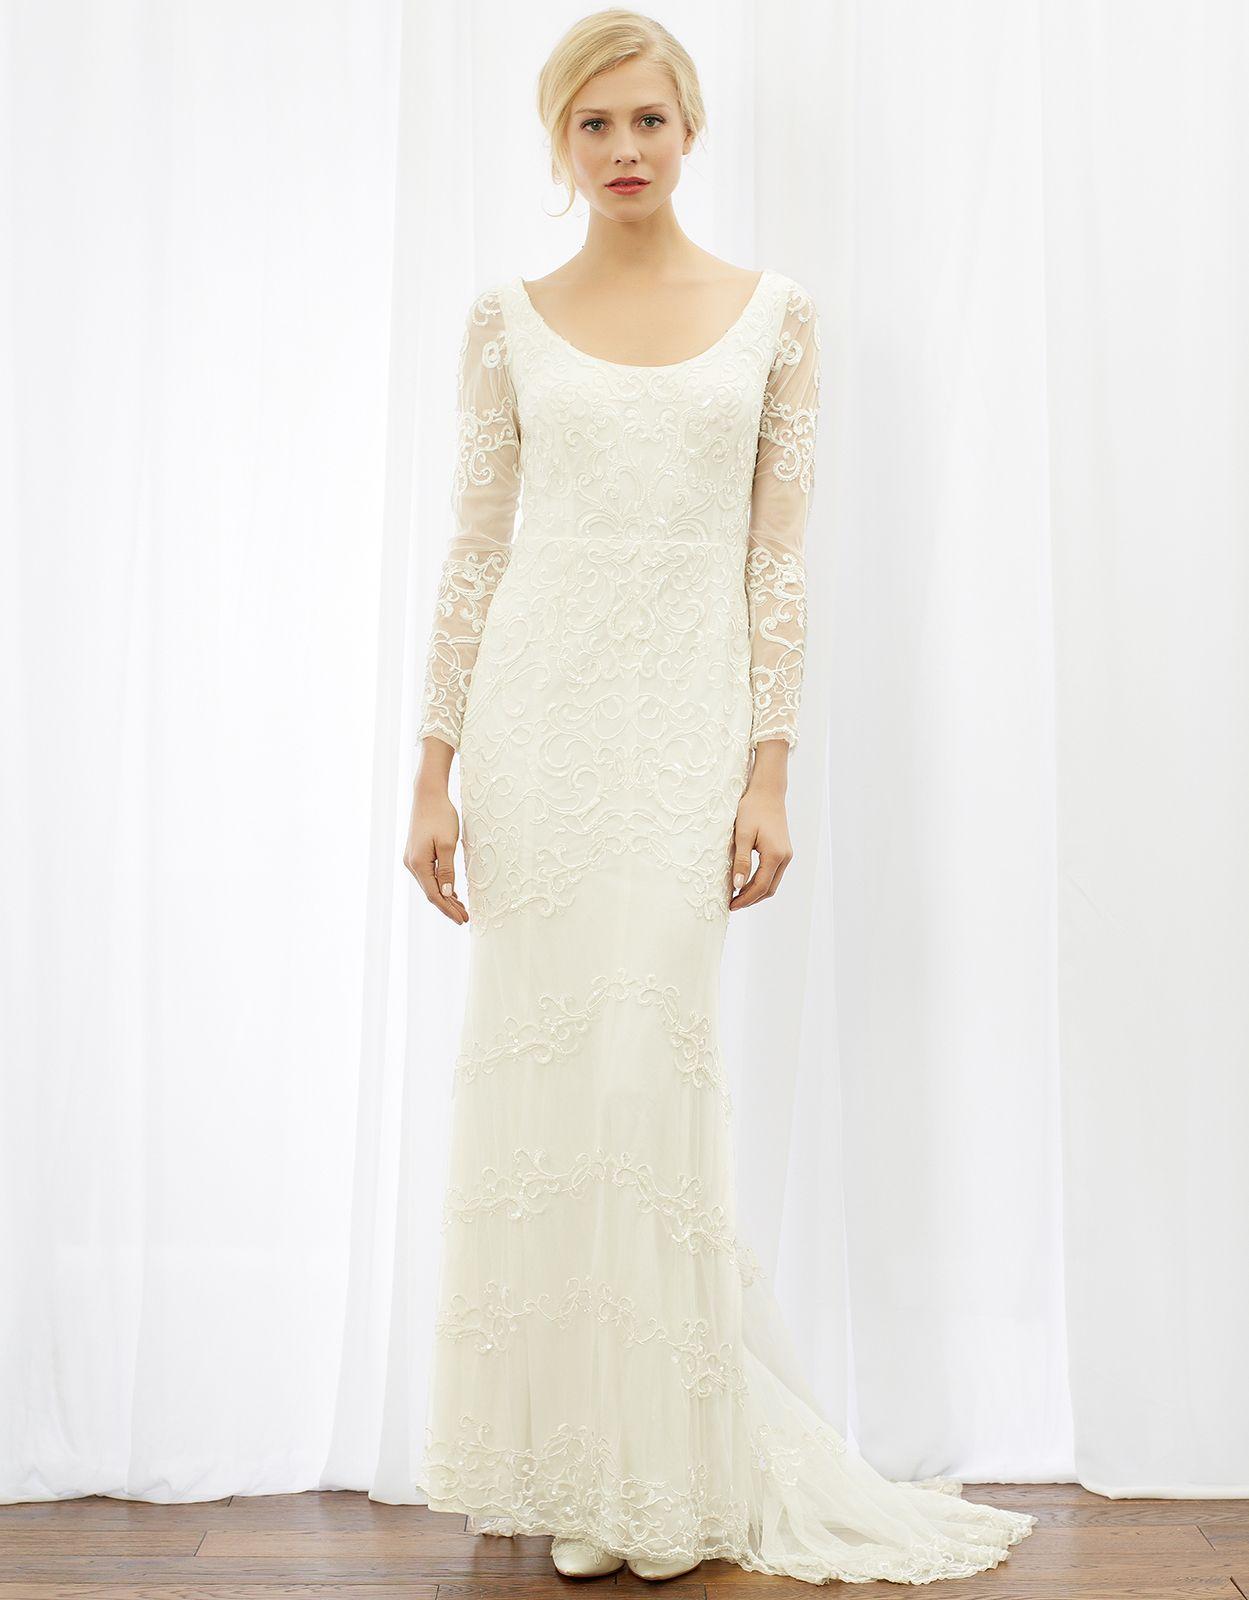 Elinor bridal dress dingheartmonsoonwedding